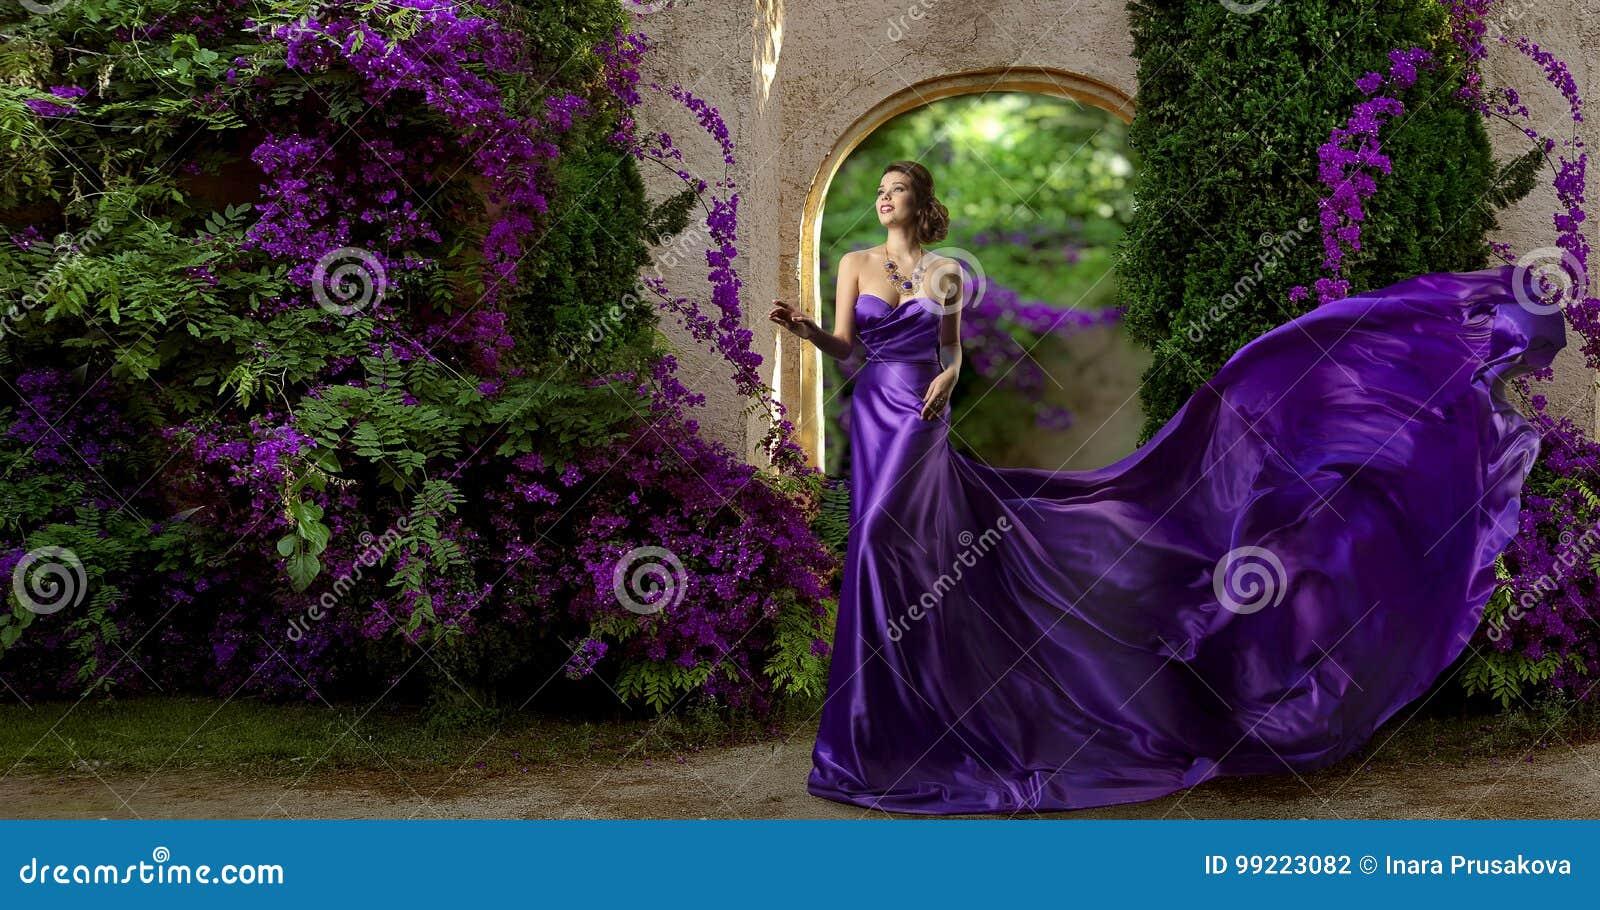 Fashion Model Purple Dress, Woman Long Silk Gown, Violet Garden